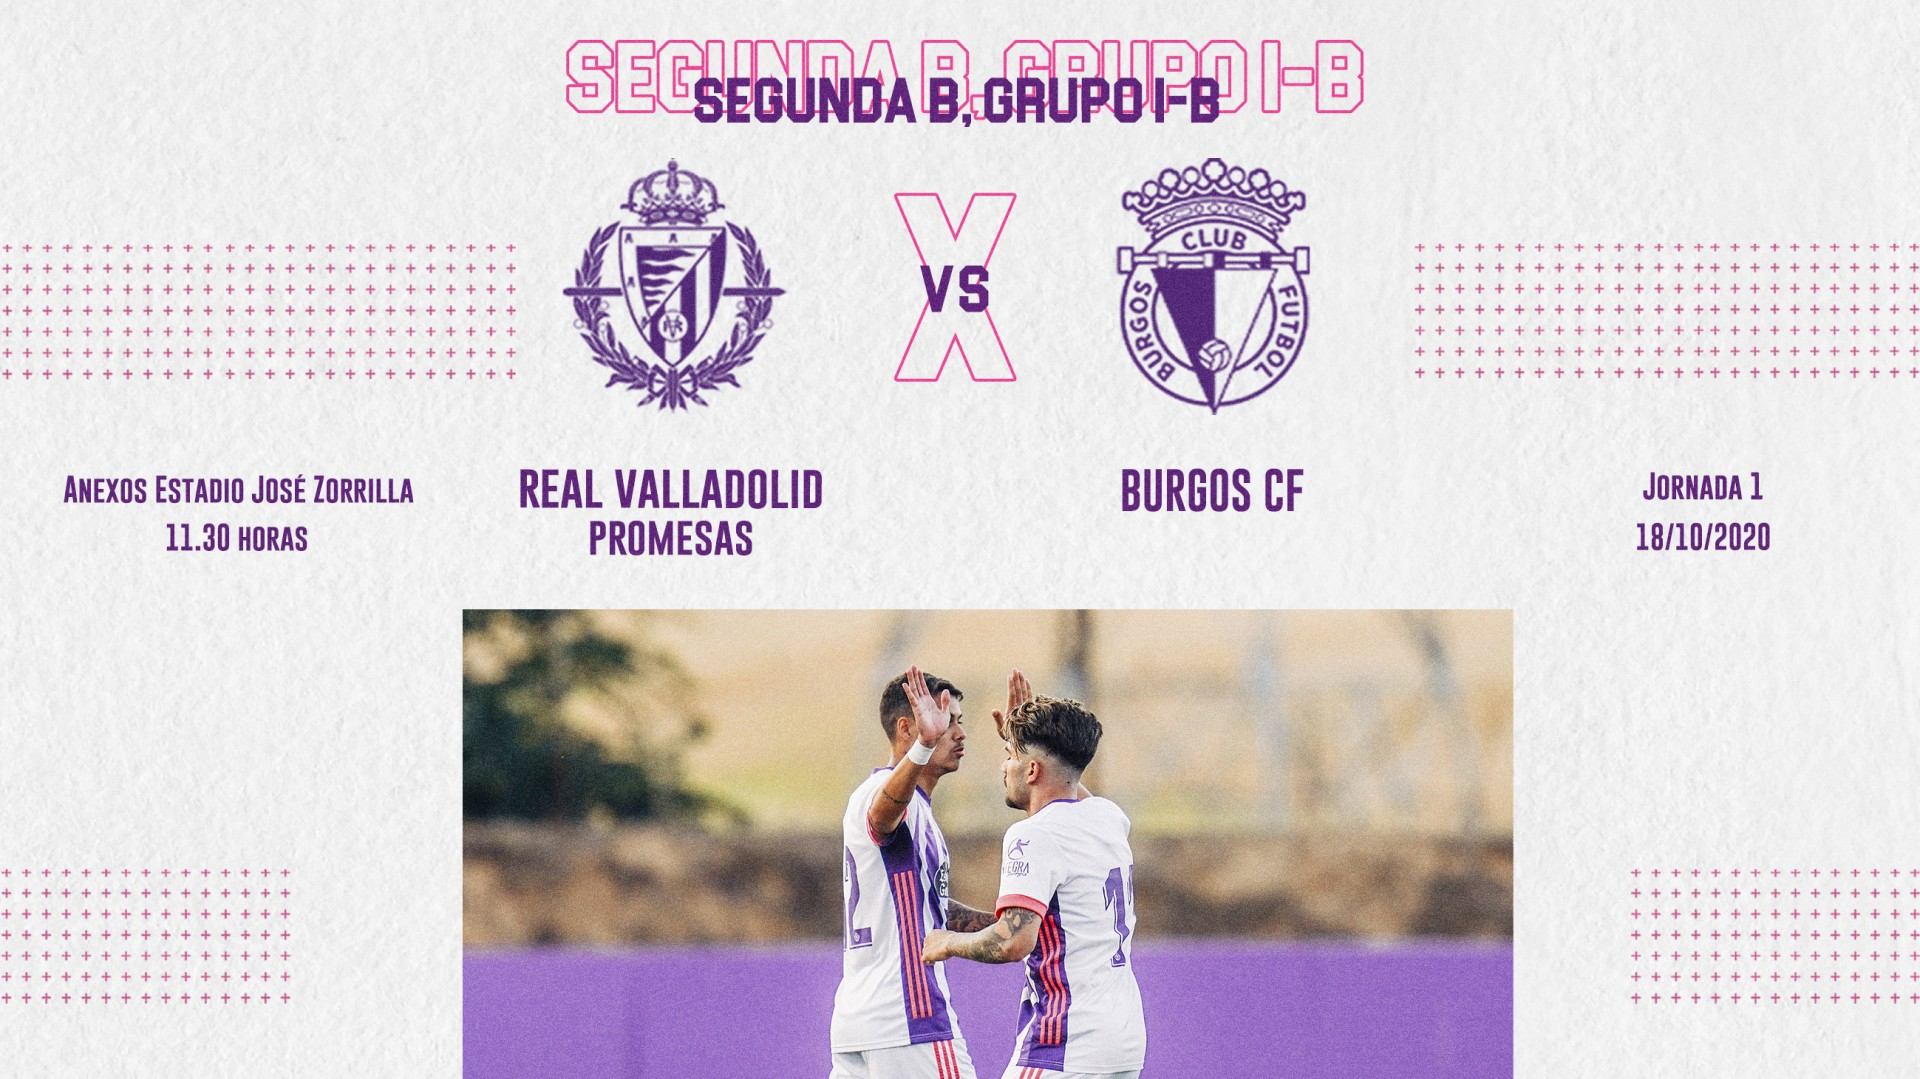 Real Valladolid PROMESAS - Temporada 2020/21 - Página 3 1920x1080a-17165724tw-man-ana